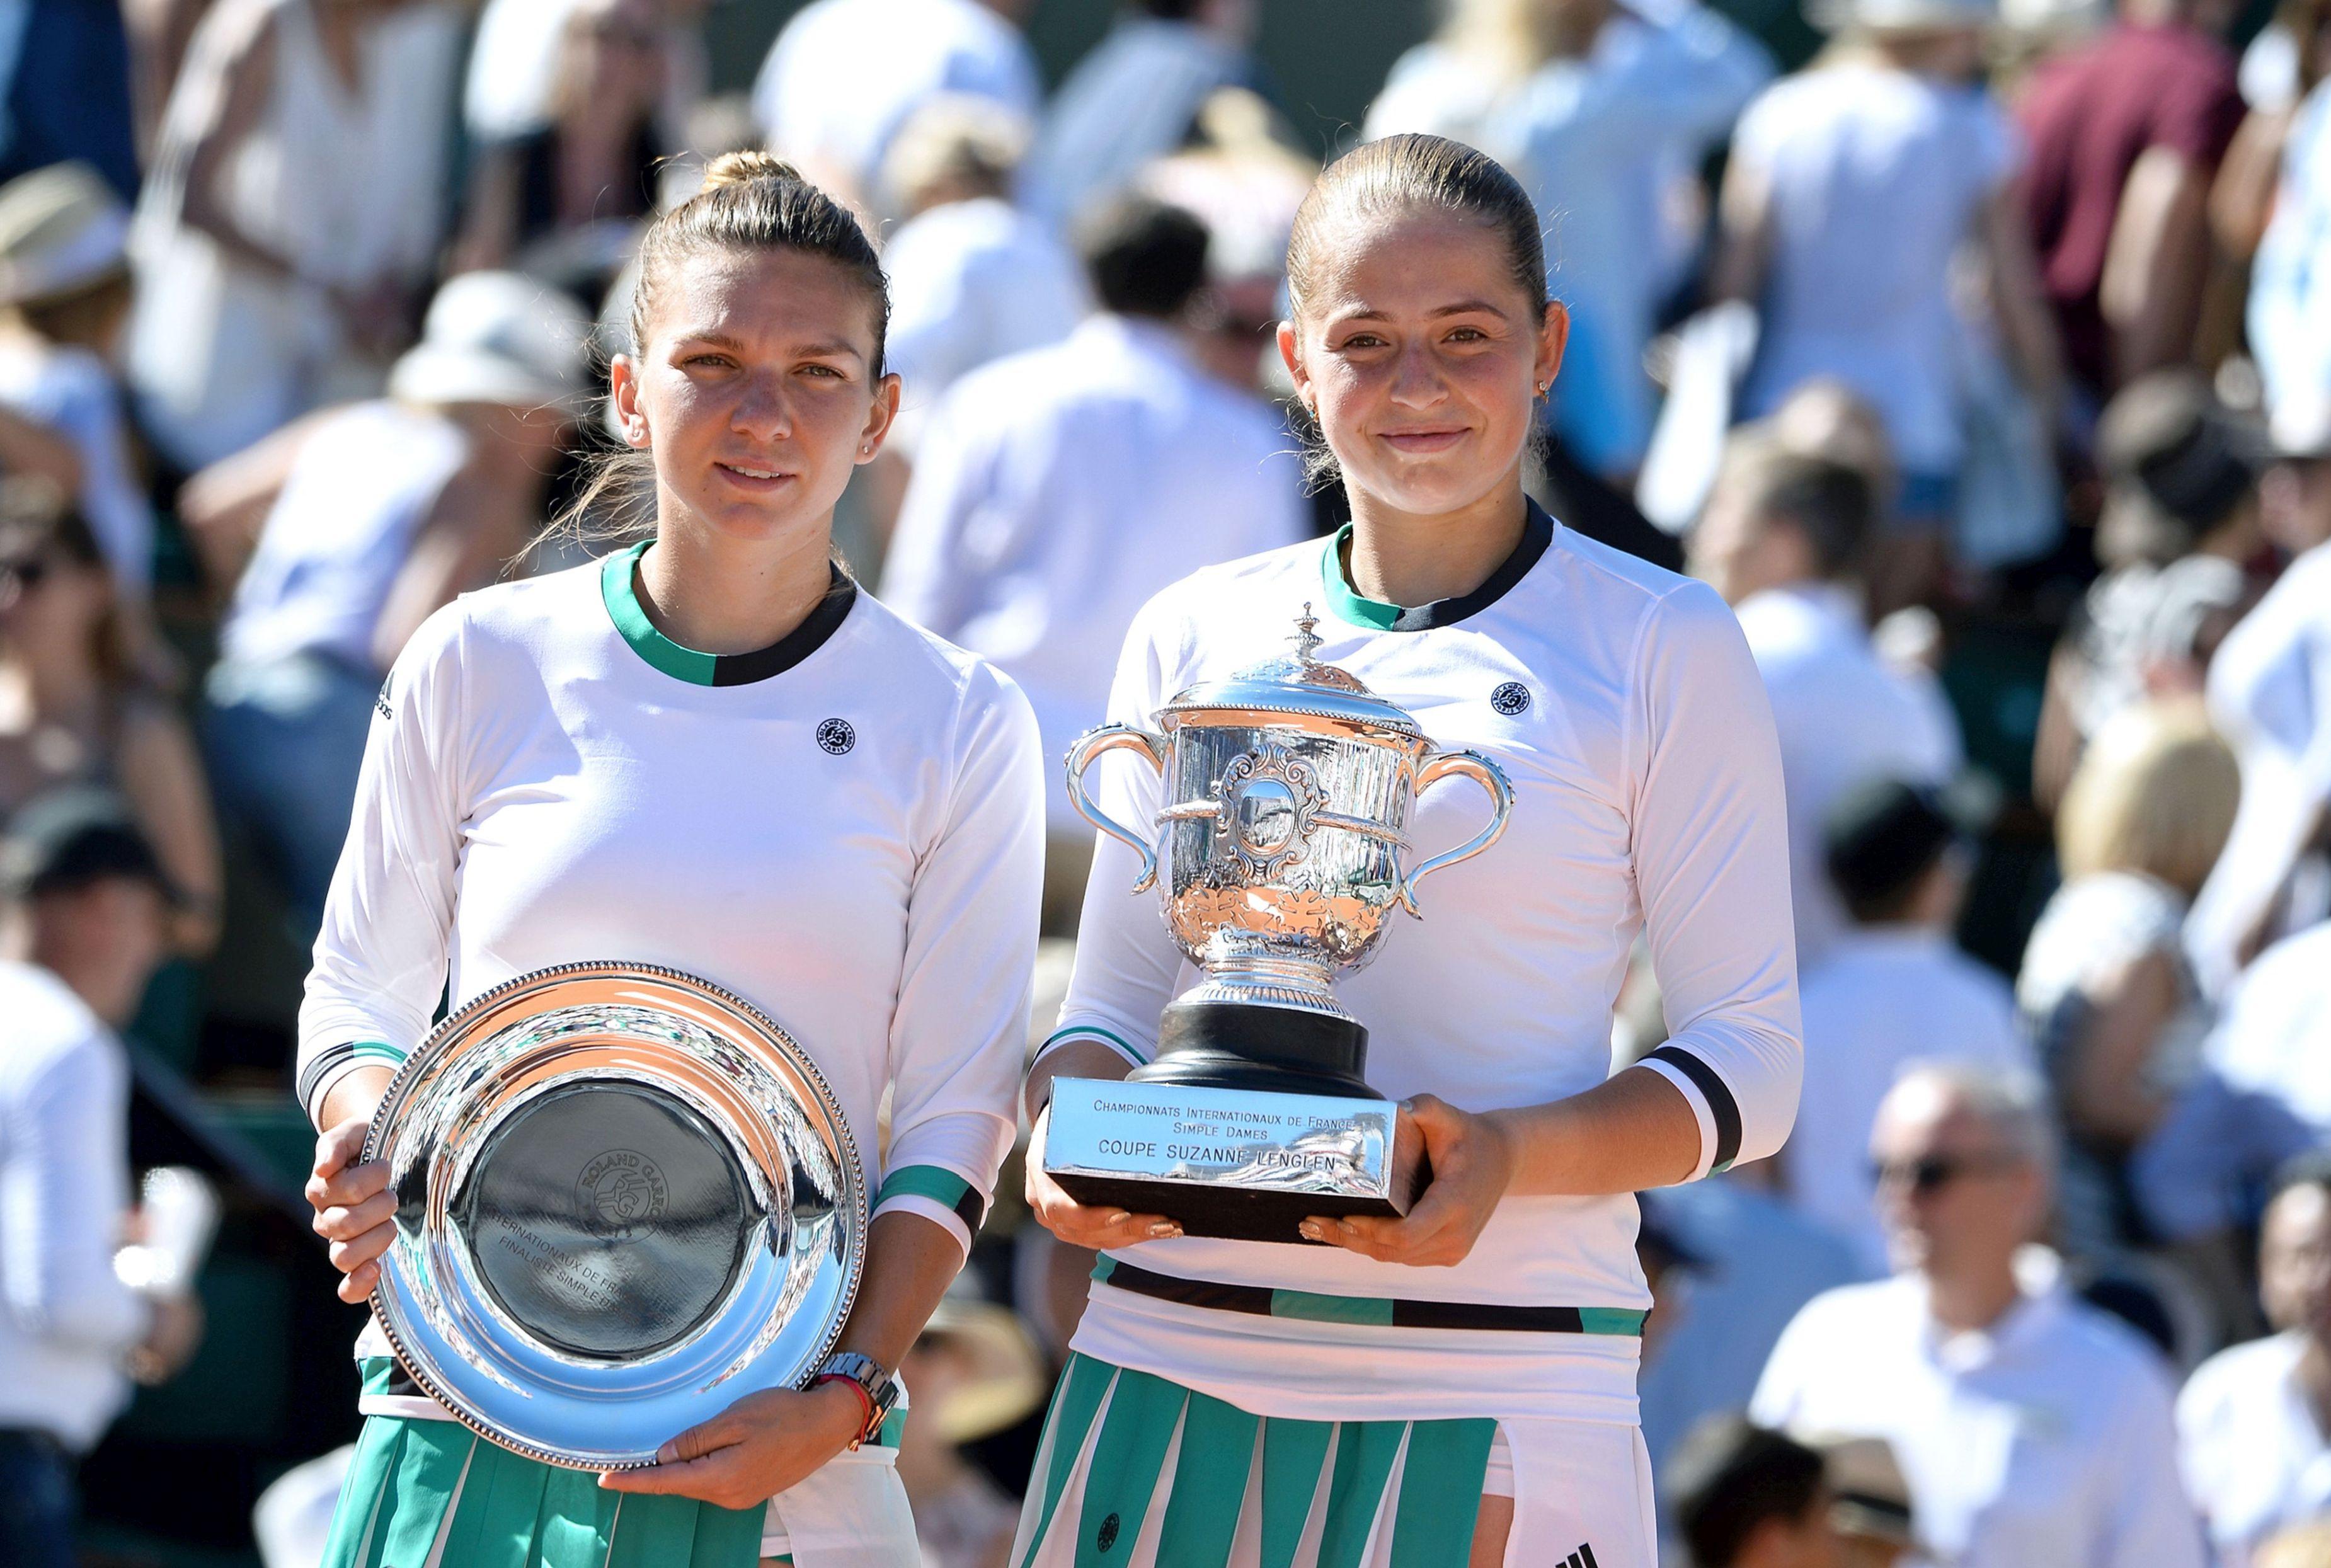 Simona Halep, Jelena Ostapenko - Internationaux de france de tennis de Roland Garros 2017 - Finale dames 10 juin 2017